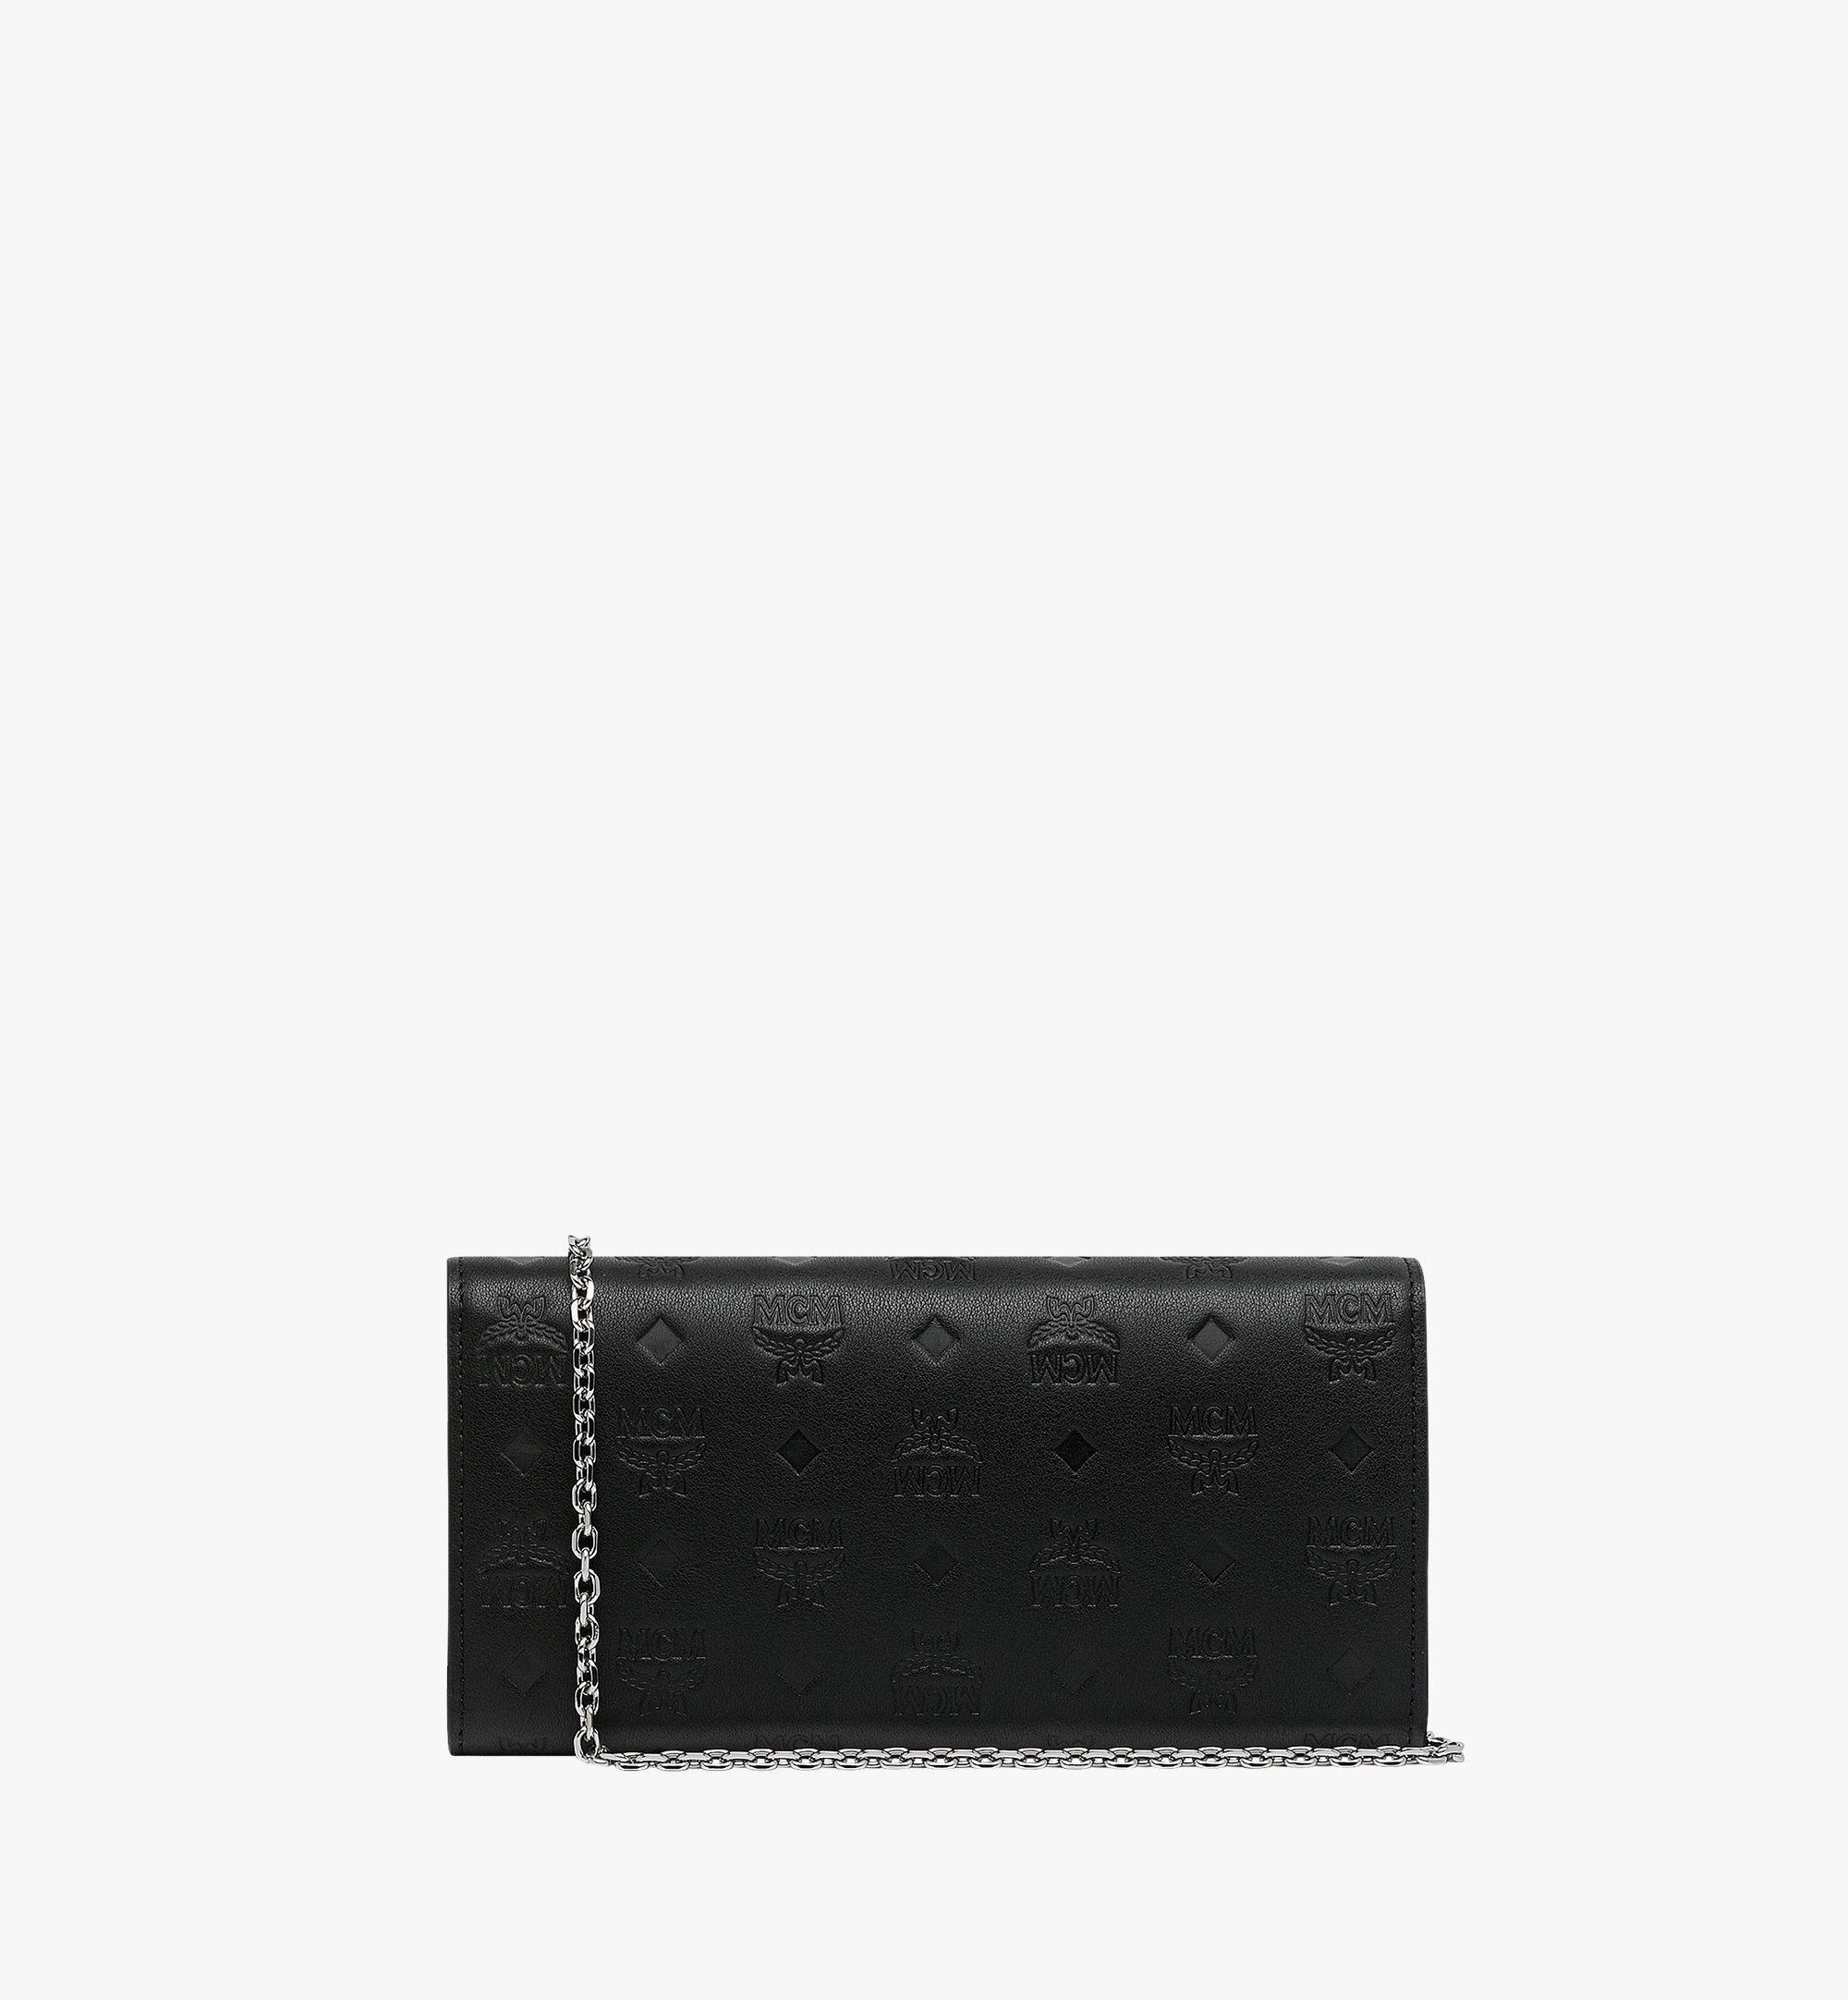 MCM Patricia Crossbody Wallet in Monogram Leather Black MYL9SPA55BK001 Alternate View 3